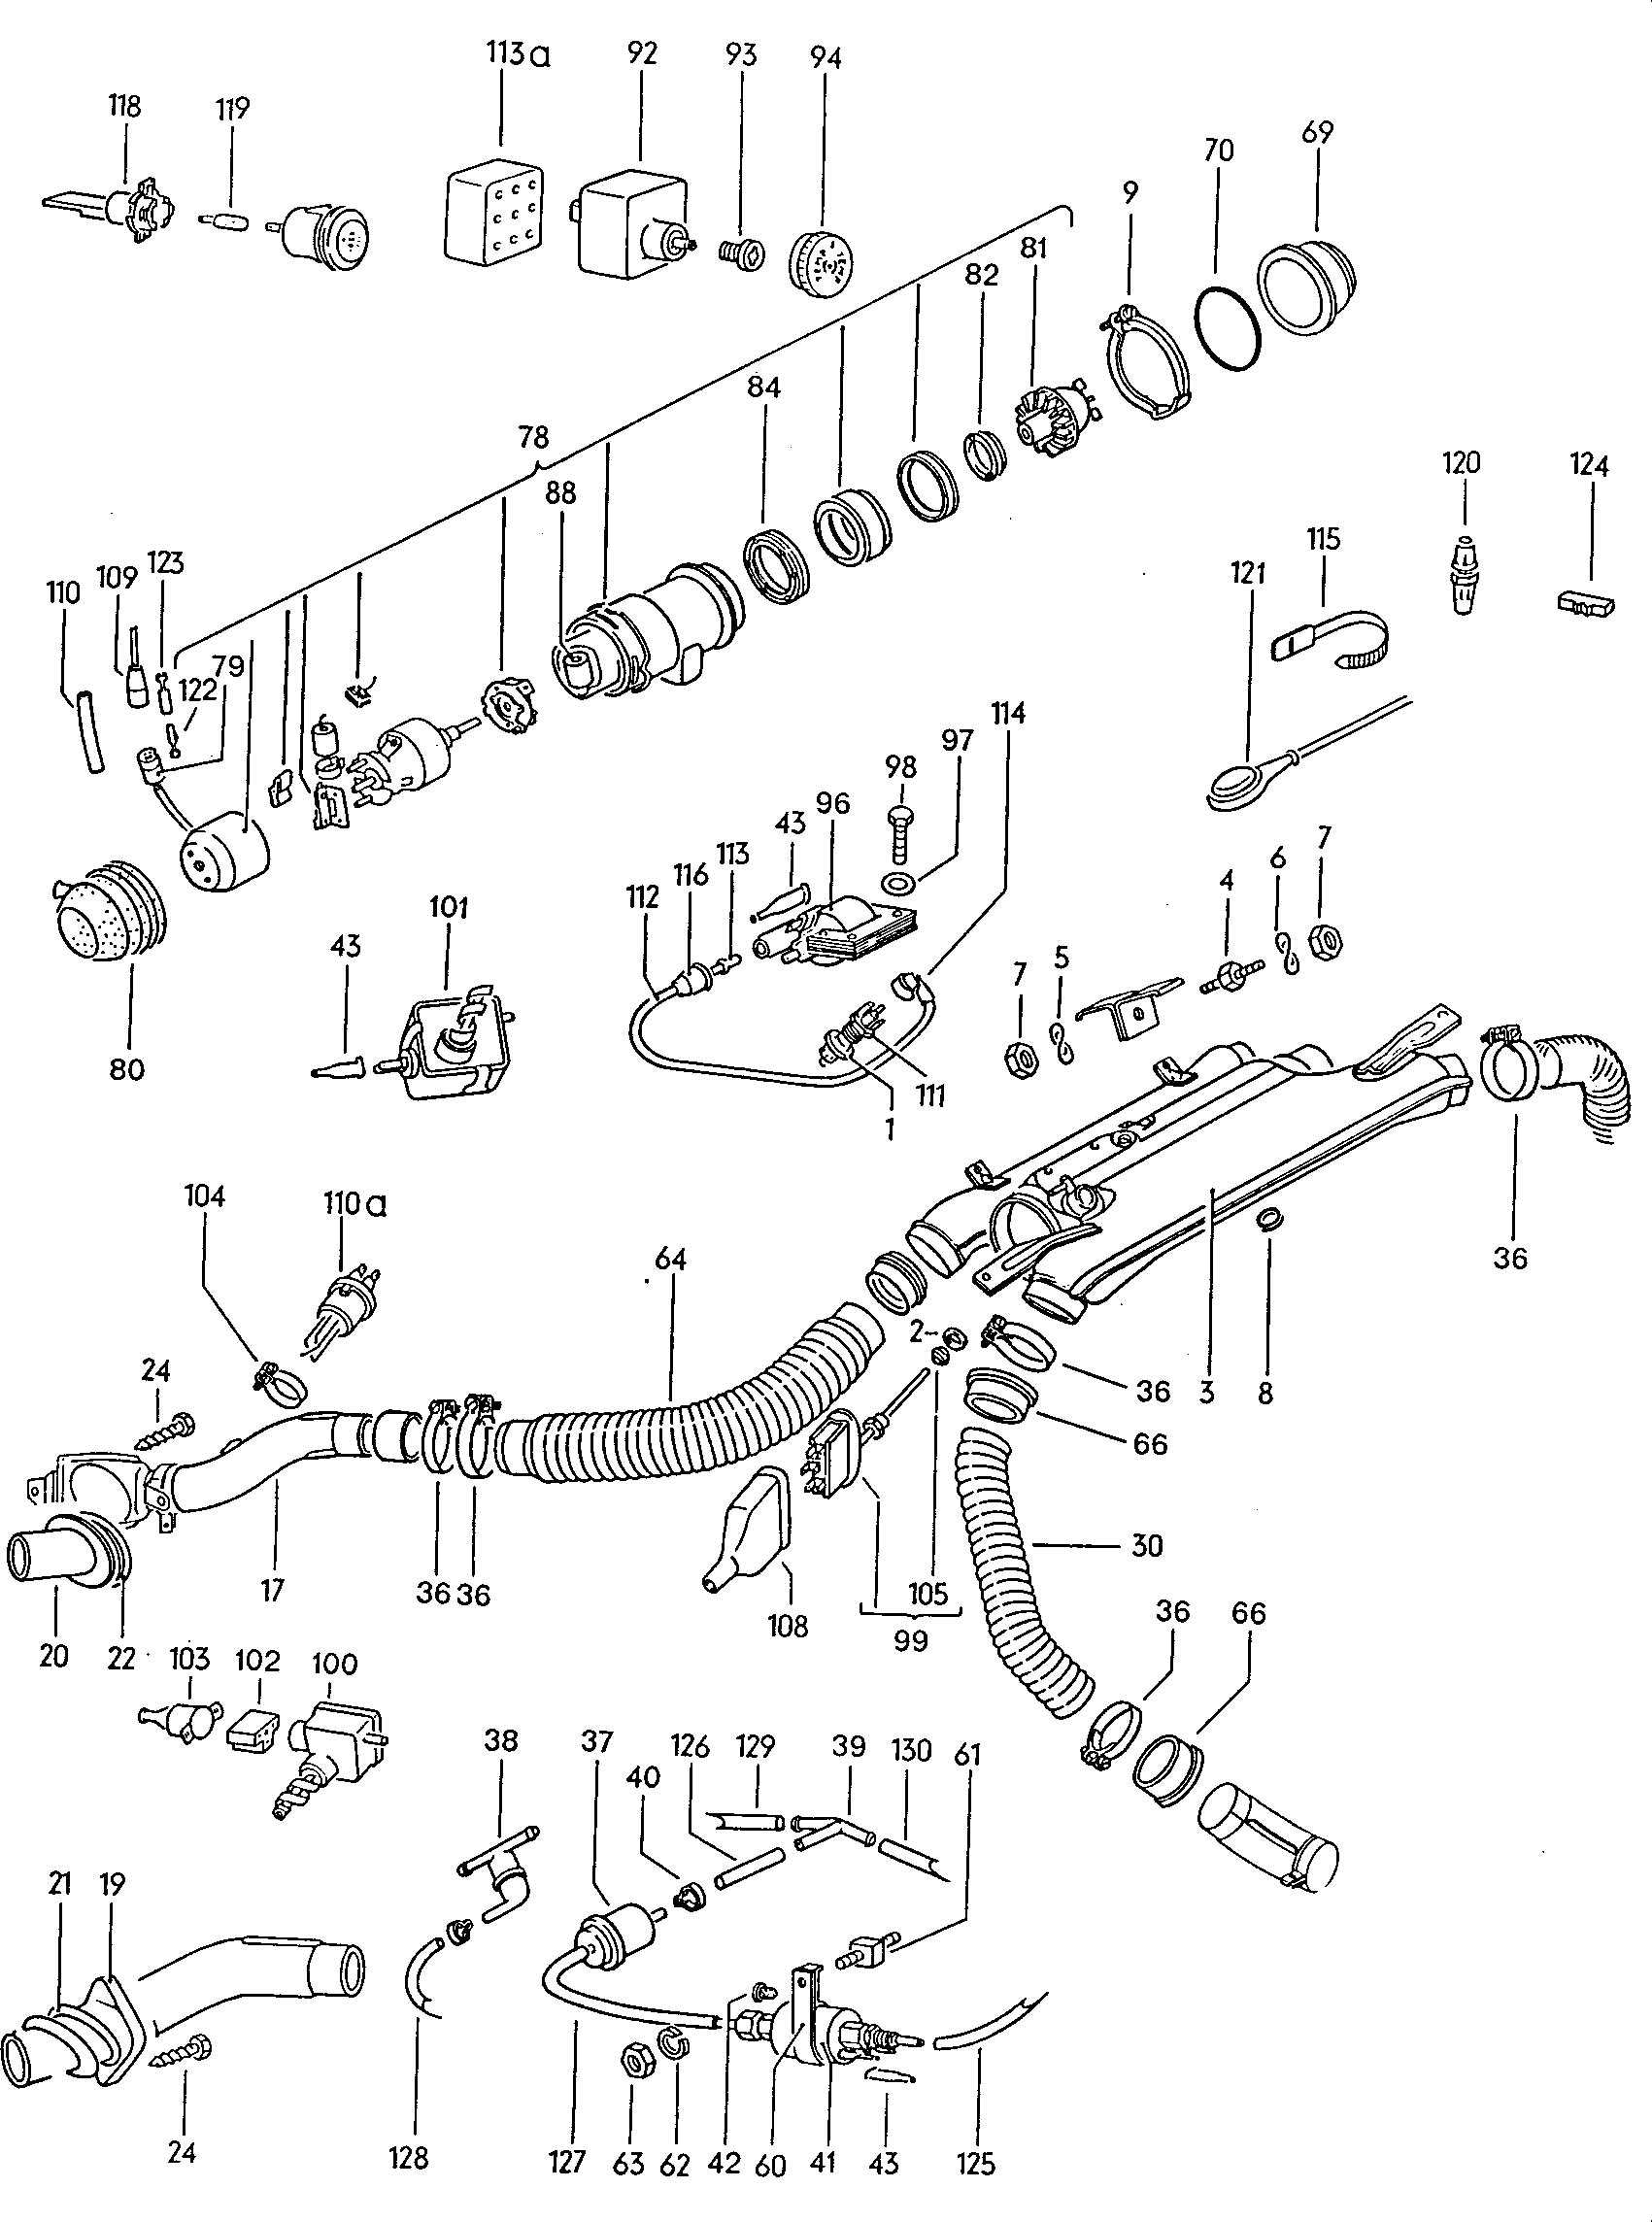 Volkswagen Type 4 Stationary Heater See Illustration